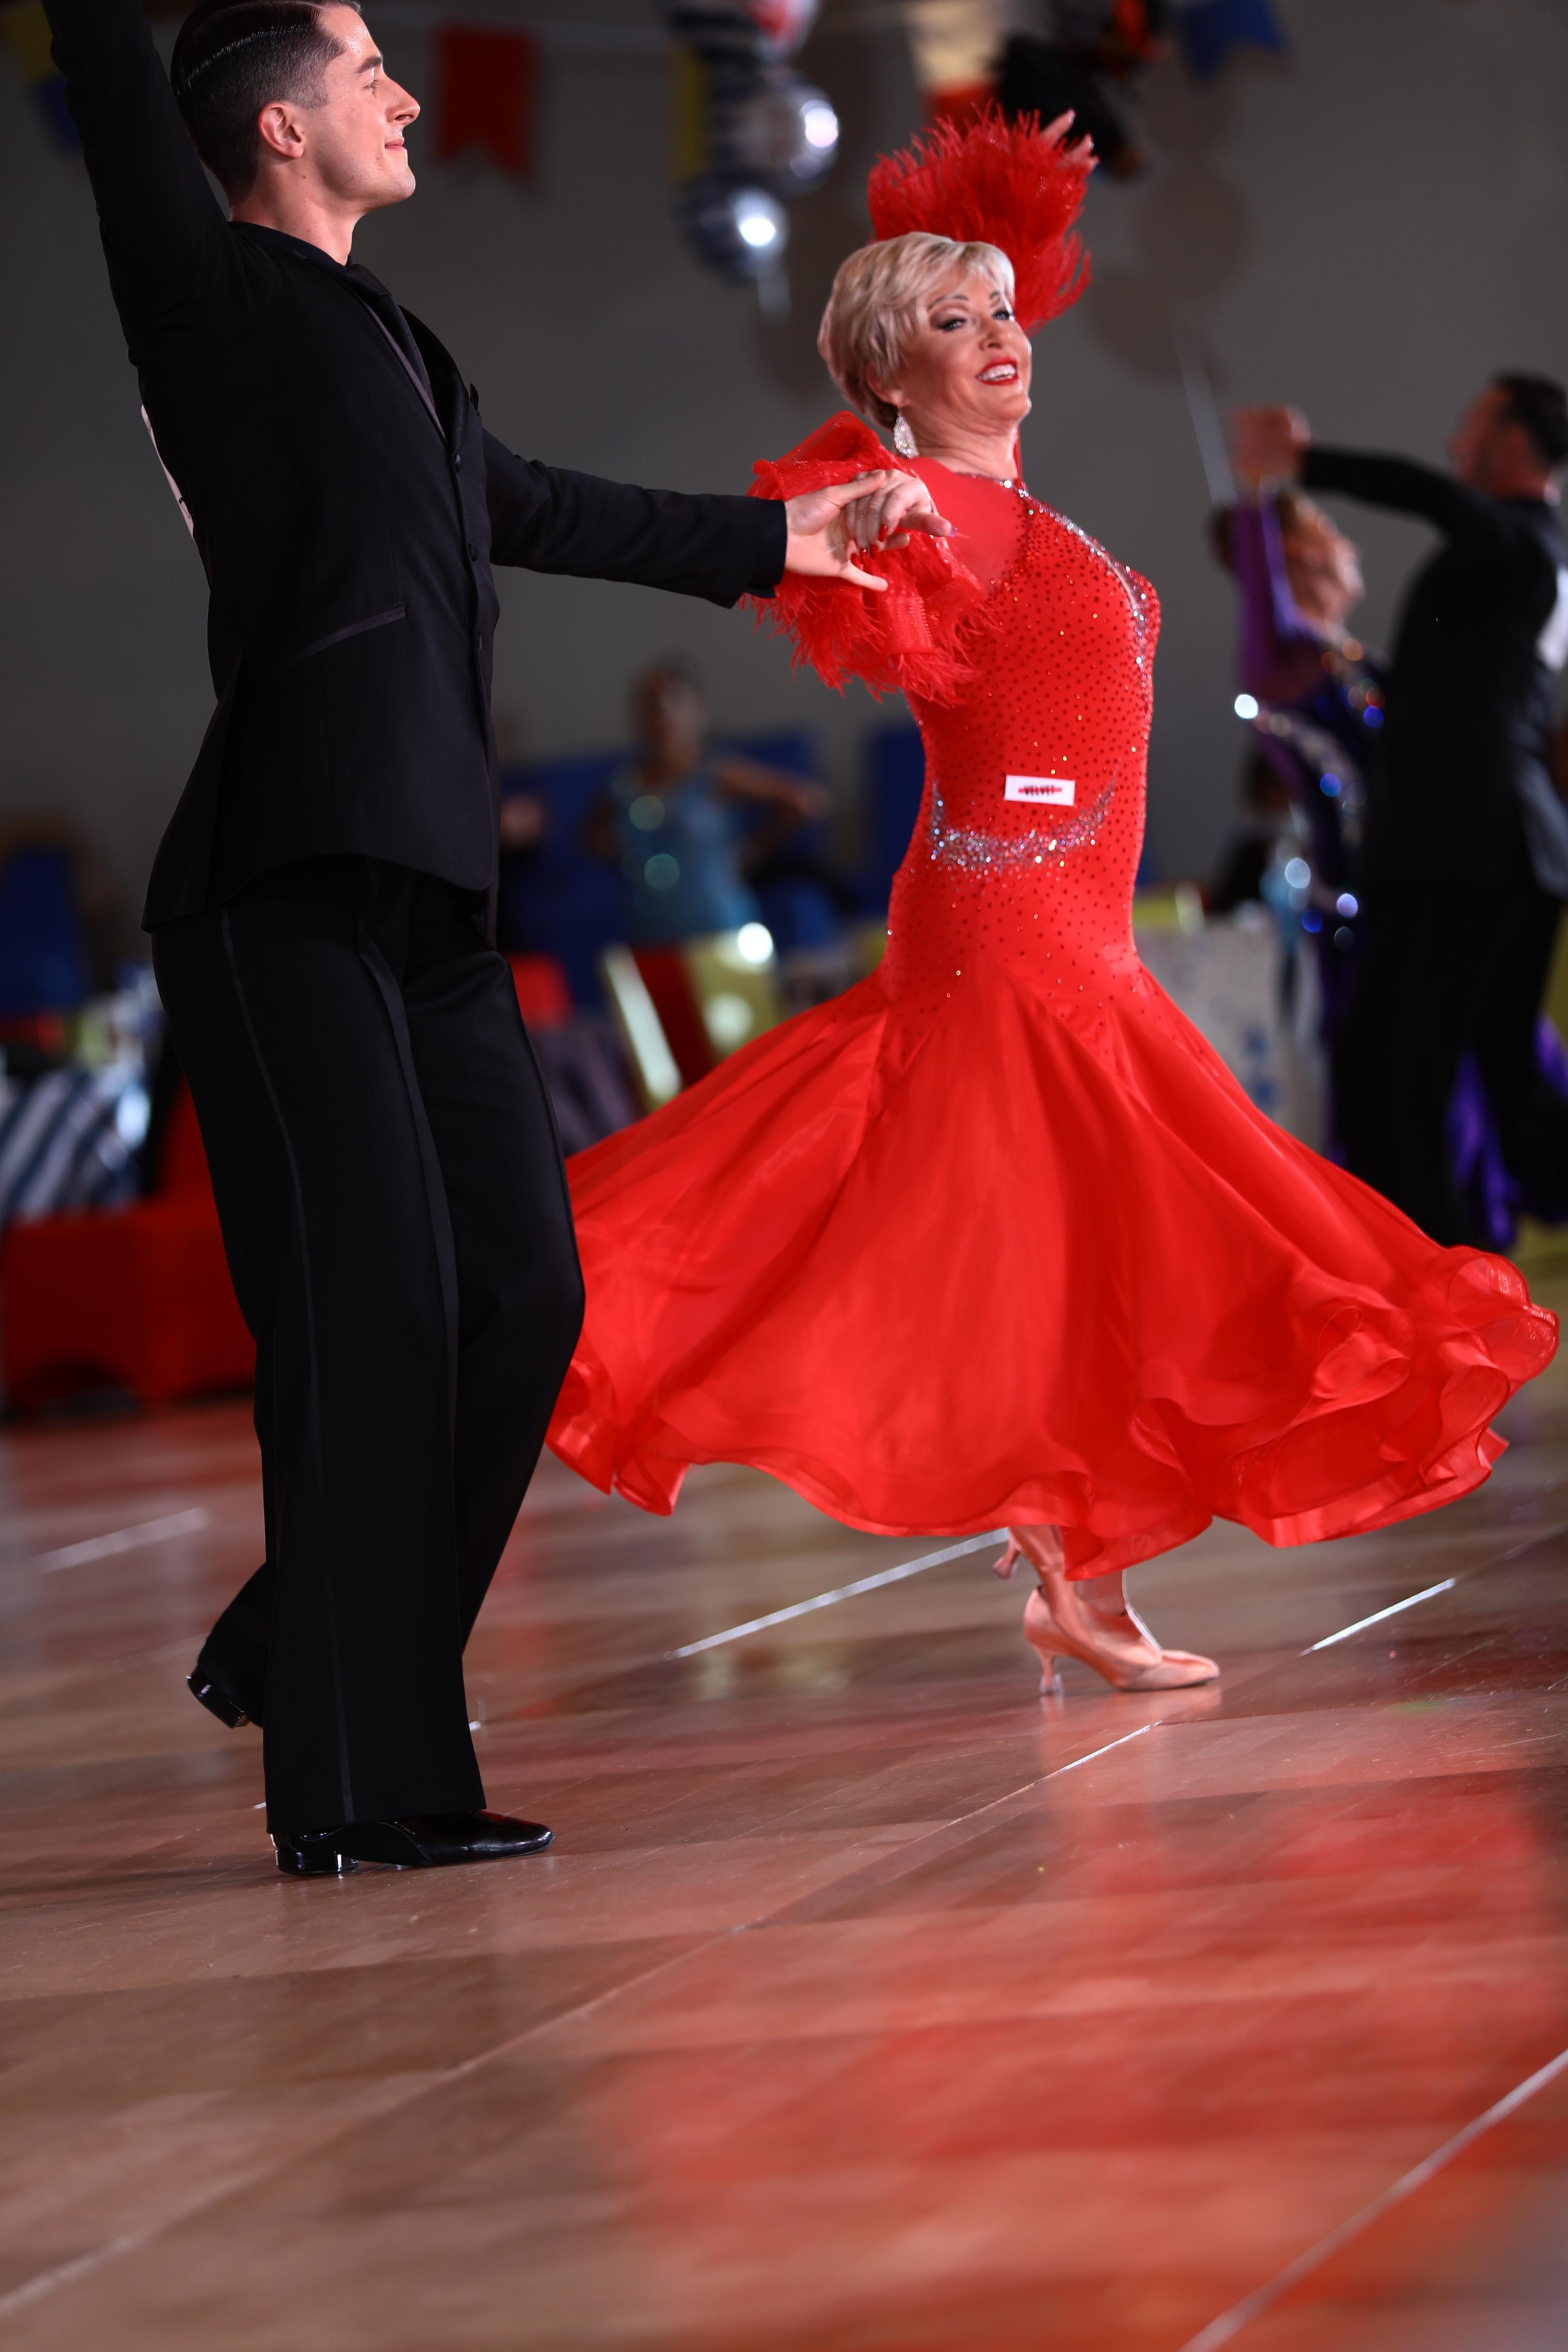 American Smooth Dance